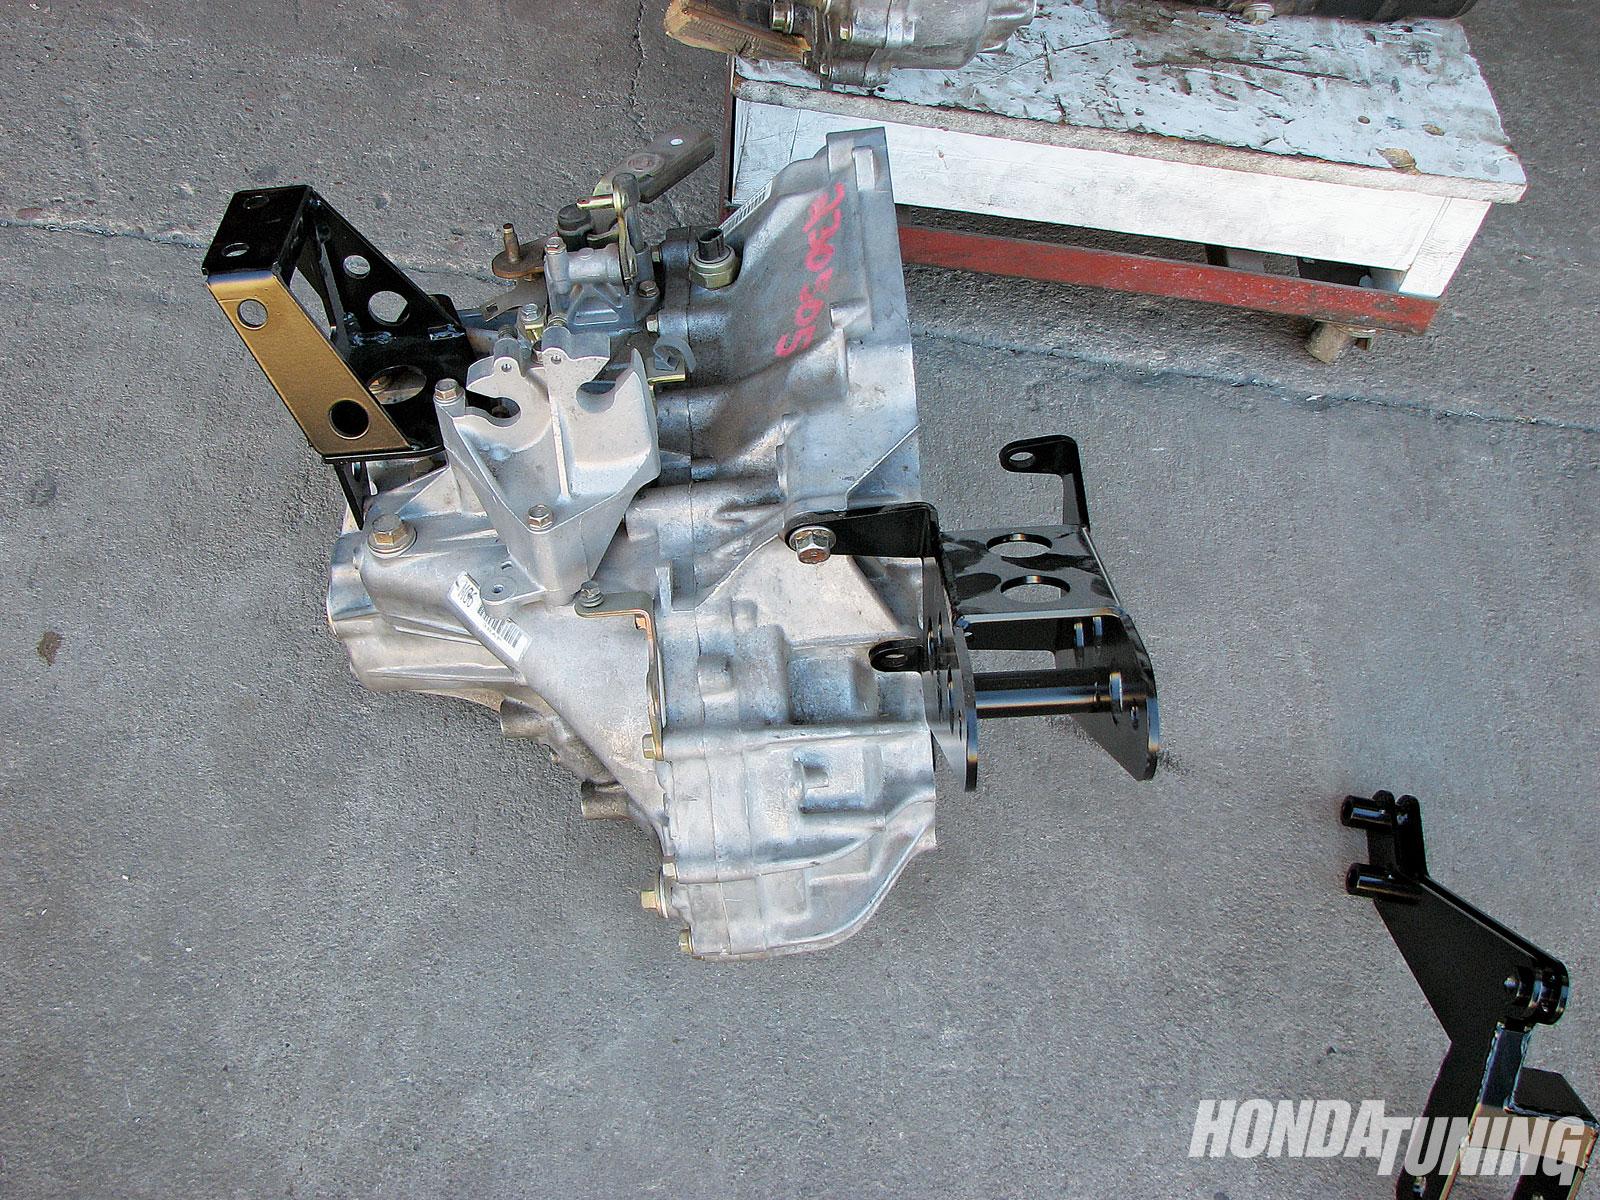 Acura RSX, Honda CRV Swap - K-Swap For Less - Honda Tuning Magazine